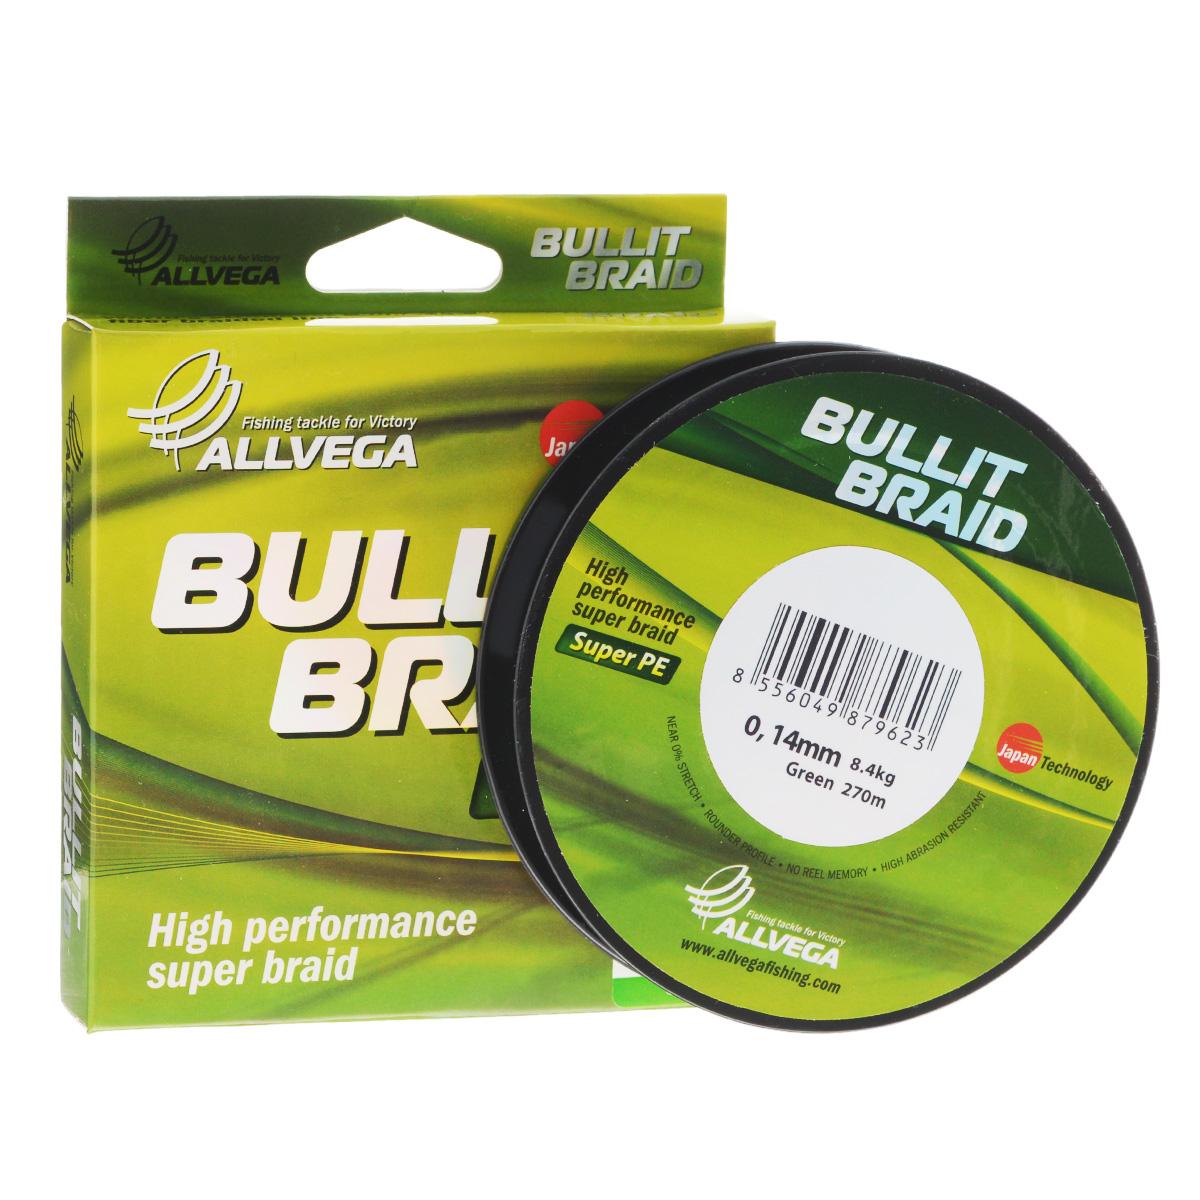 Леска плетеная Allvega Bullit Braid, цвет: темно-зеленый, 270 м, 0,14 мм, 8,4 кг